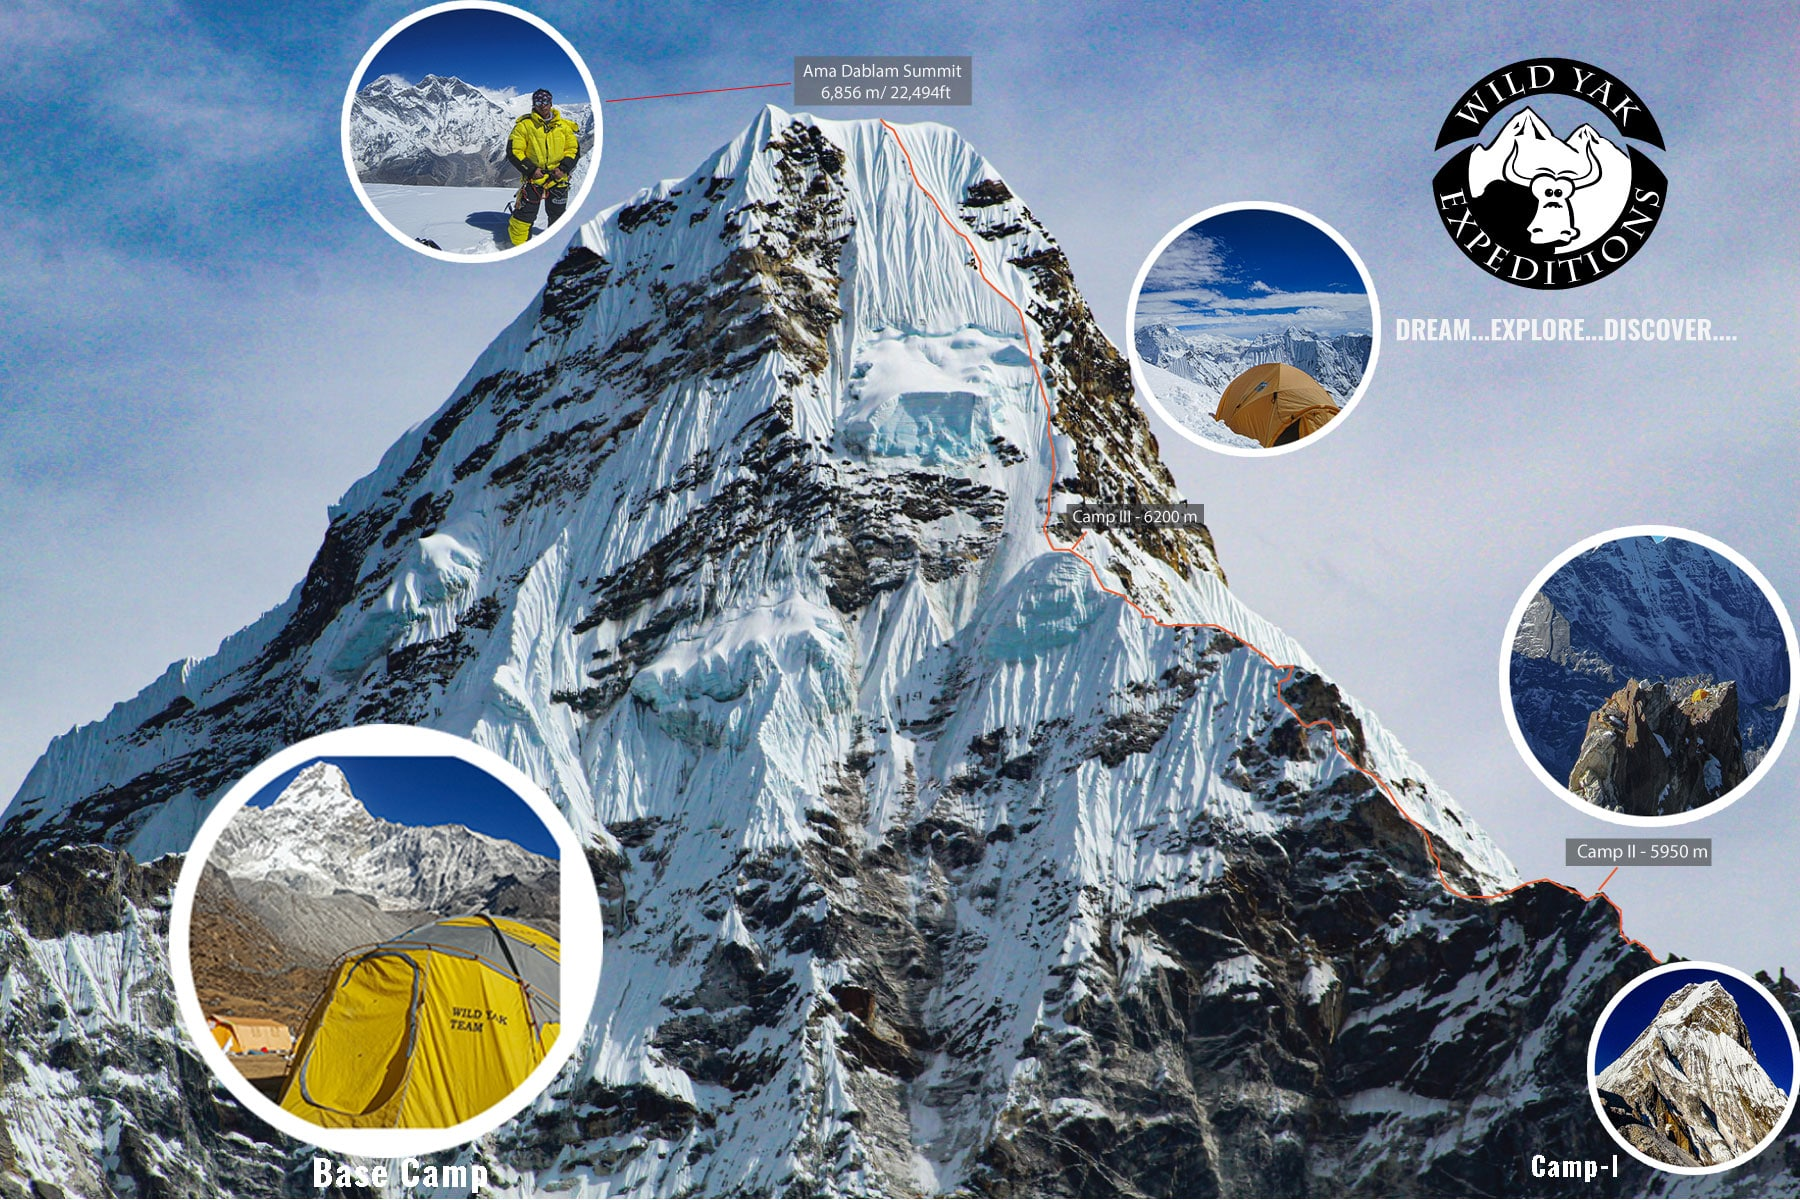 ama-dablam climbing route Nepal